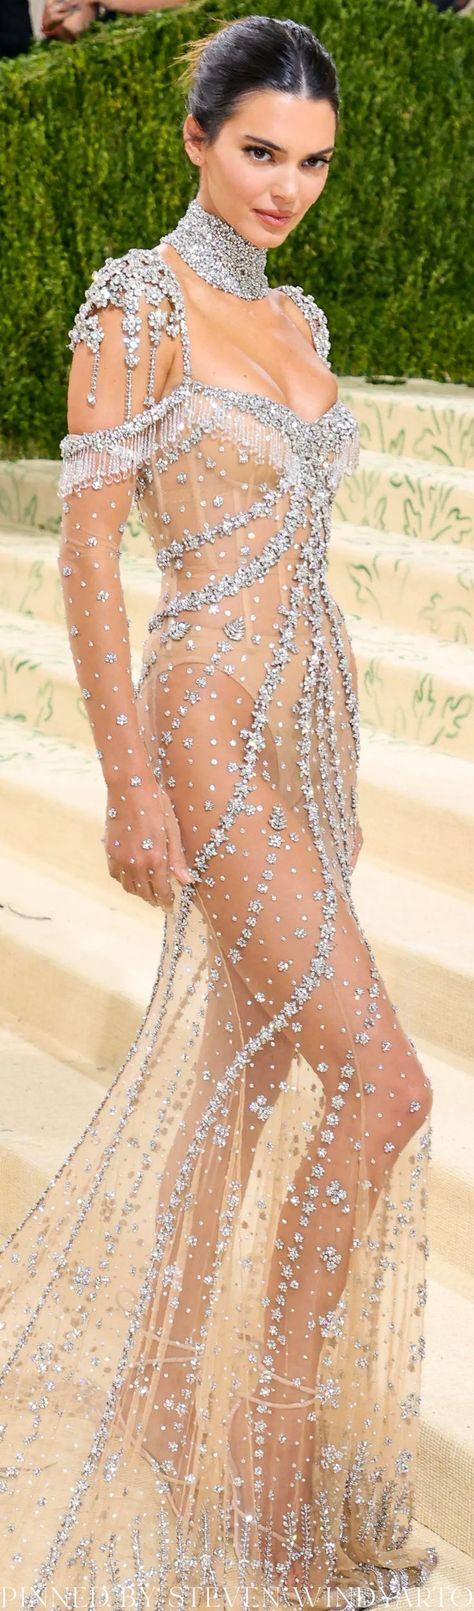 Kendall Jenner Look From The 2021 Met Gala Red Carpet #metgala2021 #metgala #kendalljenner